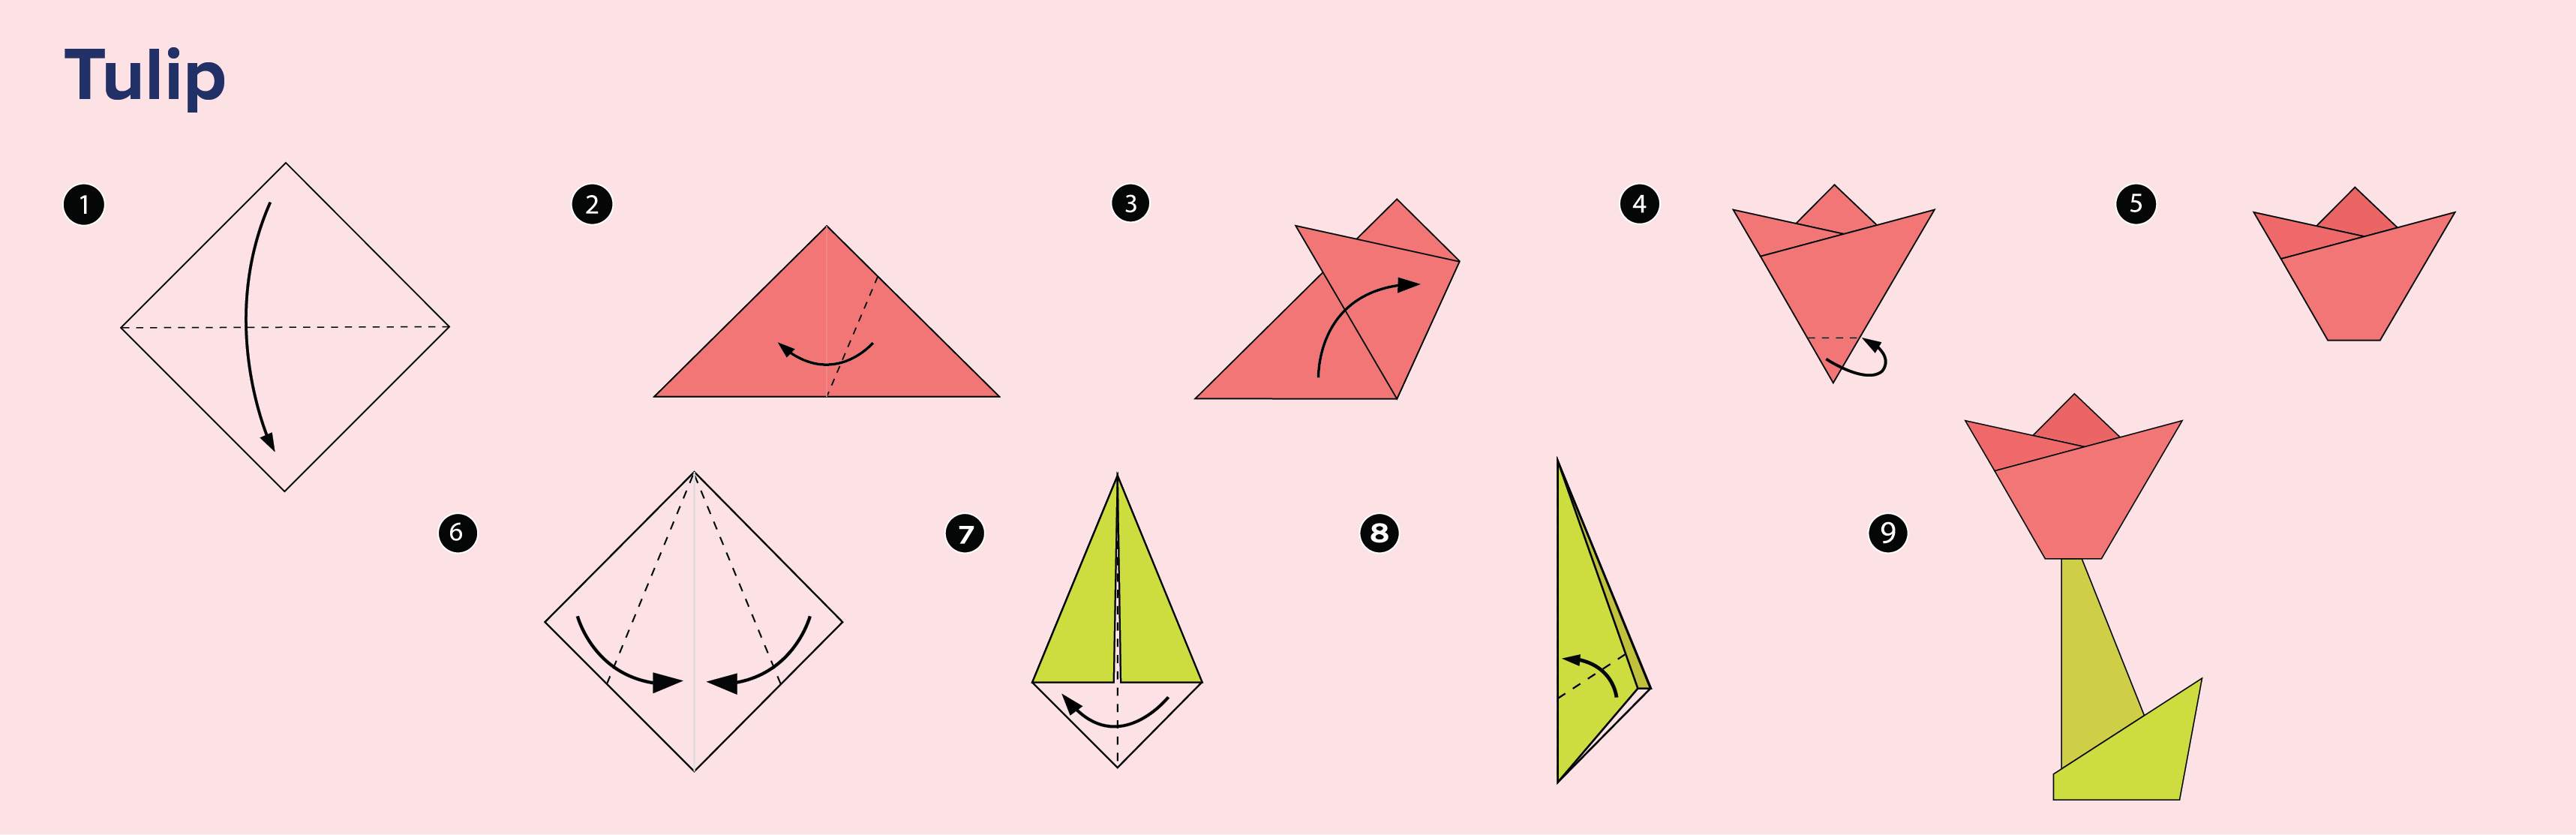 How to make: paper Pterodactyl. dinosaur. Птеродактель из бумаги ... | 1113x3434